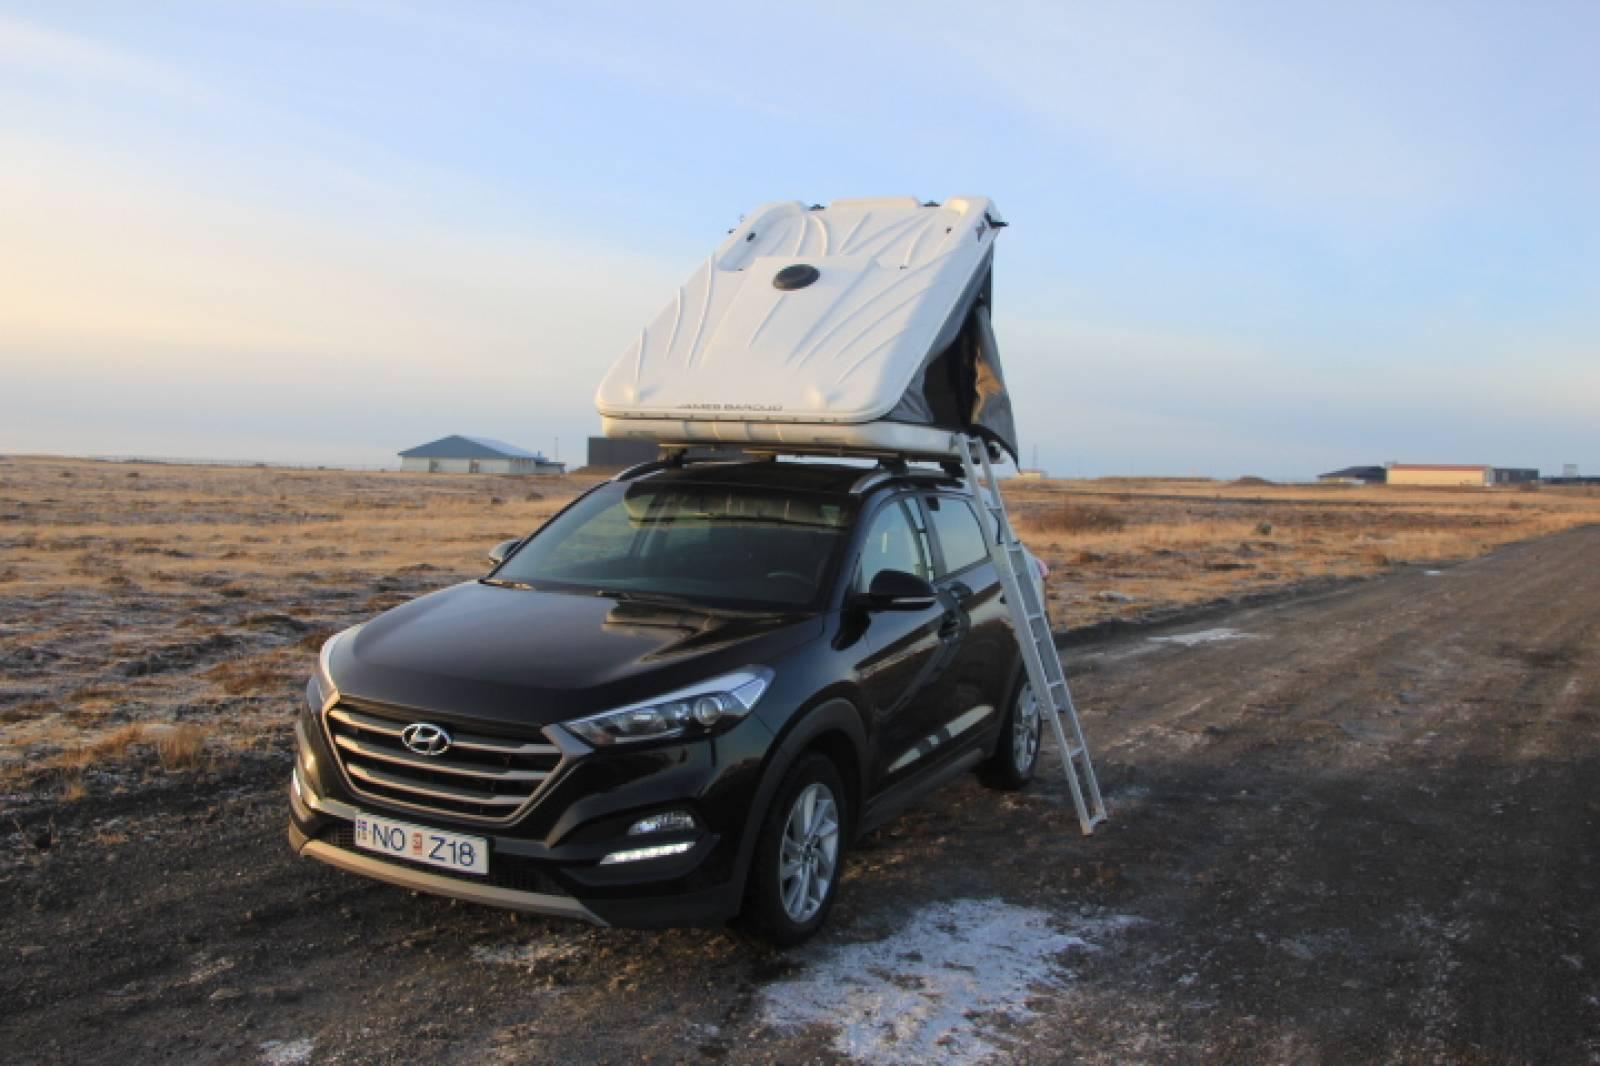 Hyundai Tucson + Roof Tent